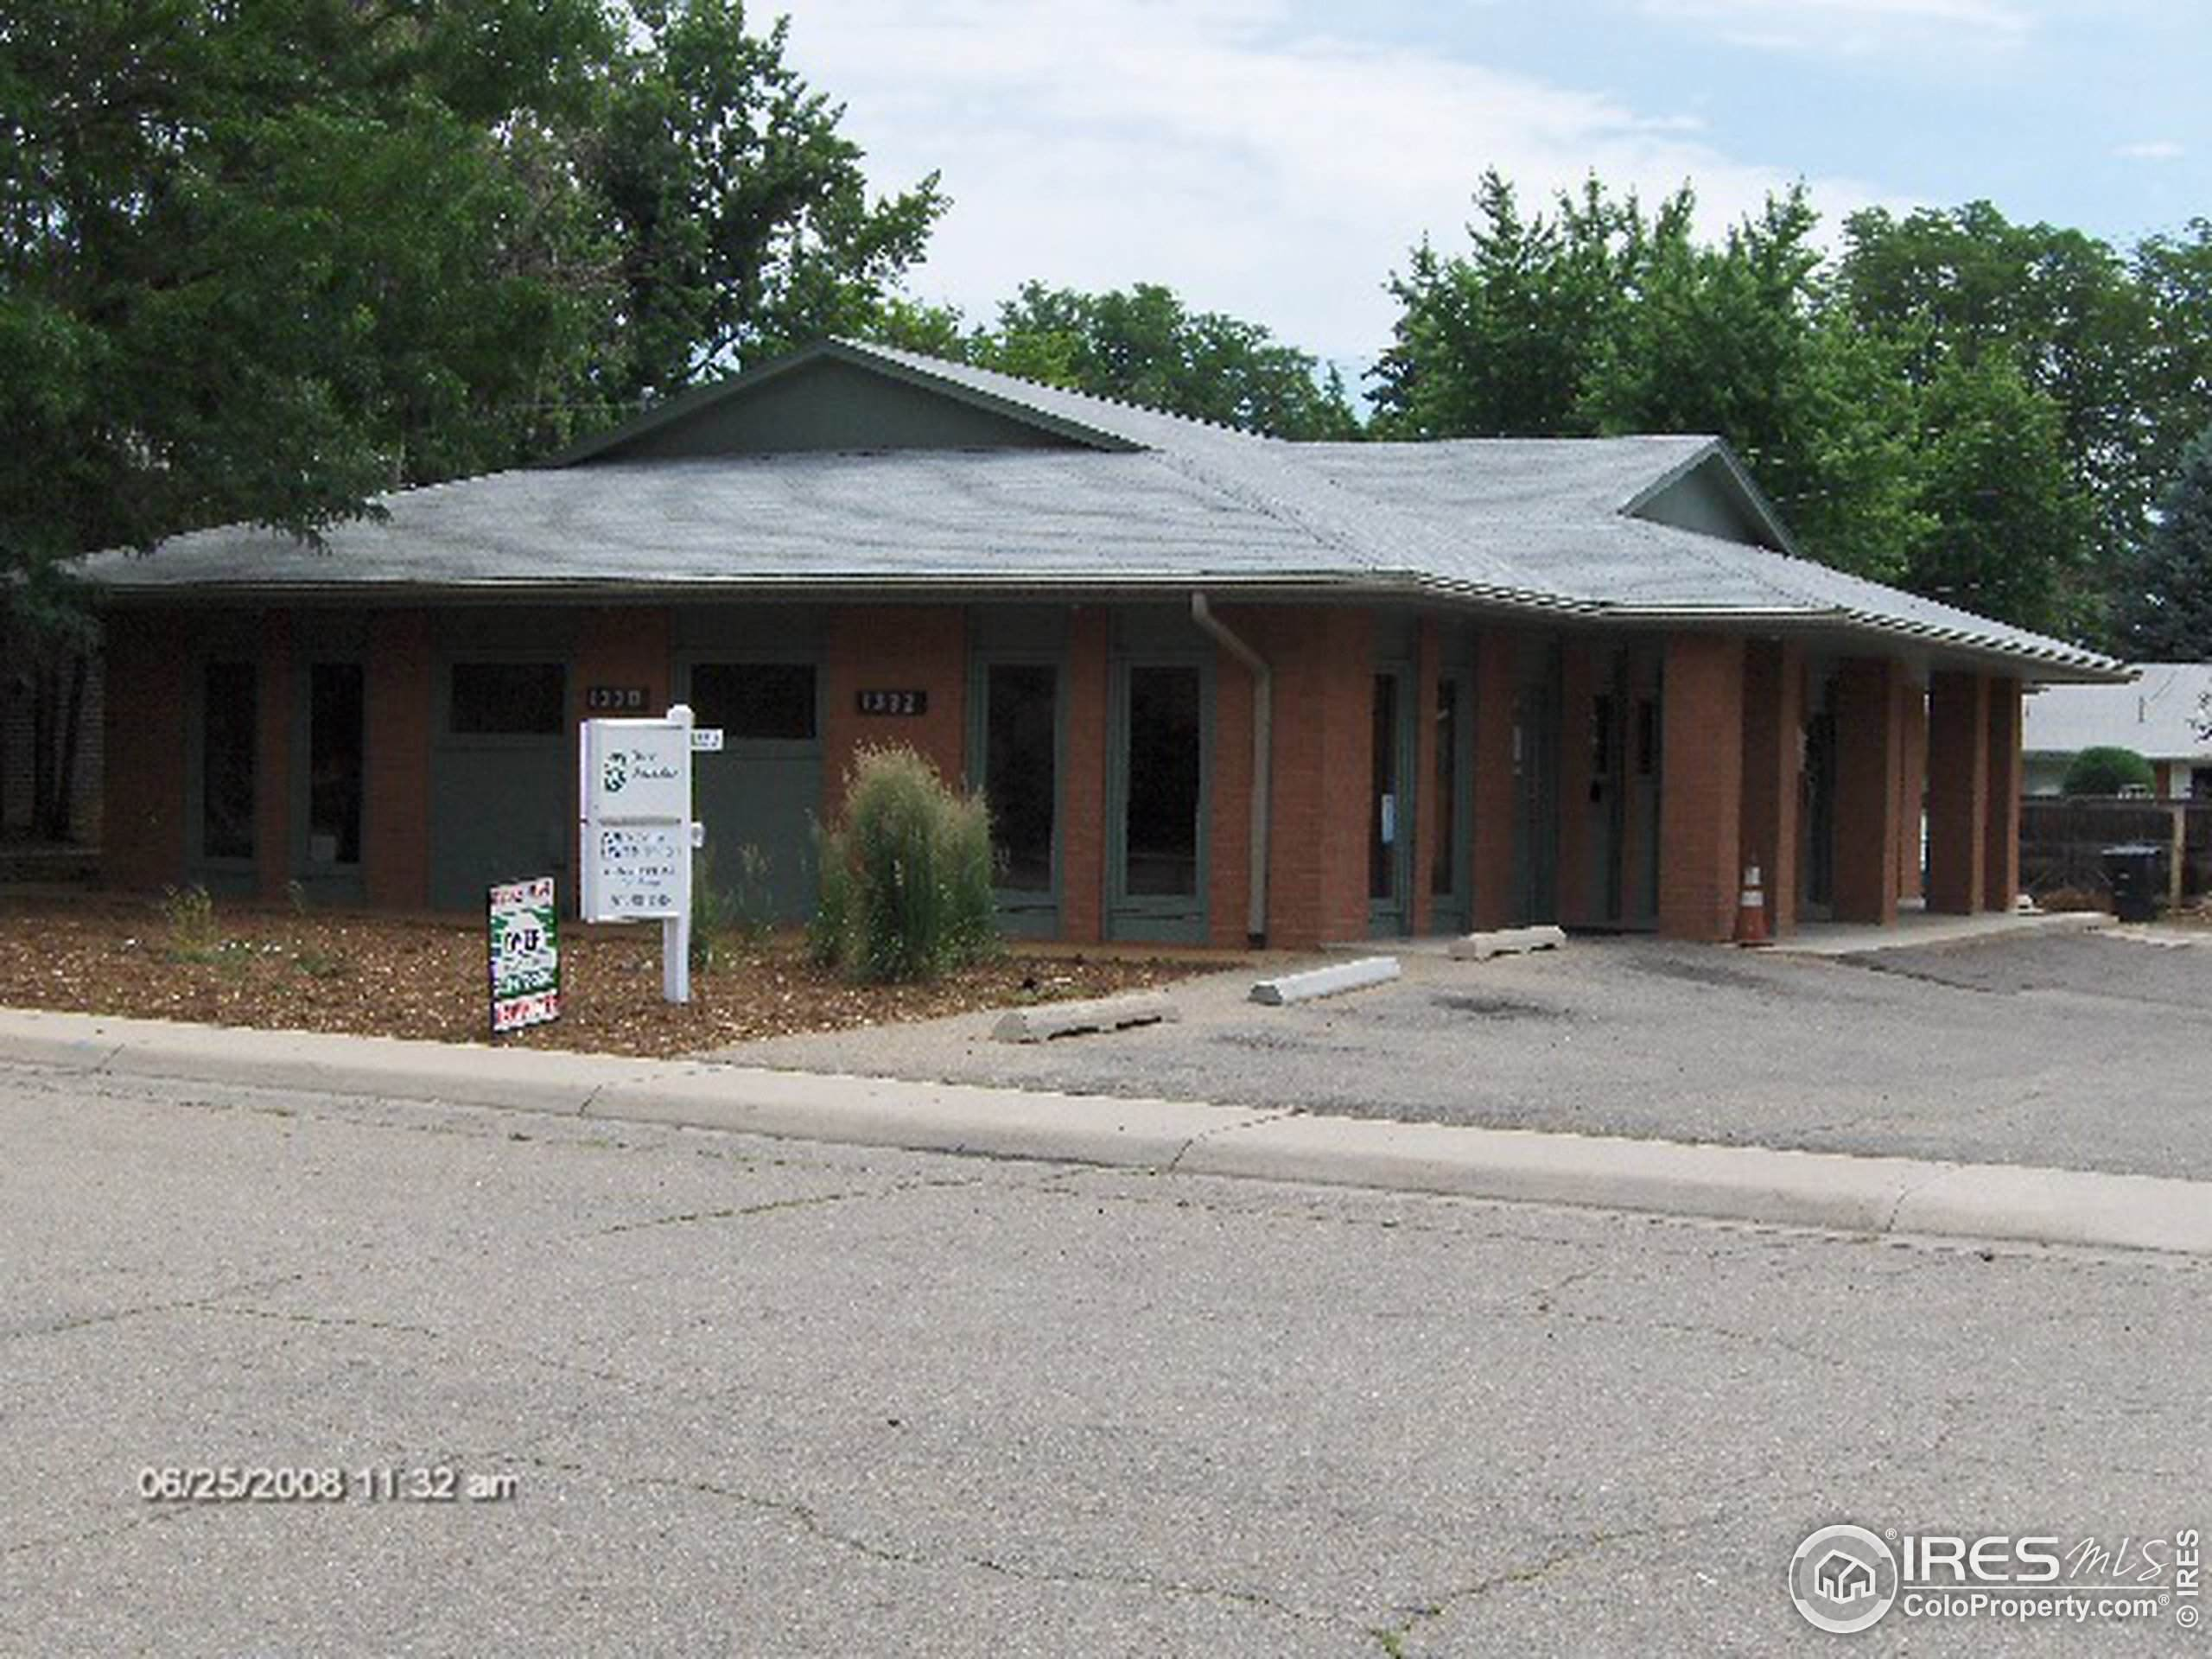 127 Barberry Pl, Loveland, CO 80537 (MLS #903283) :: Wheelhouse Realty